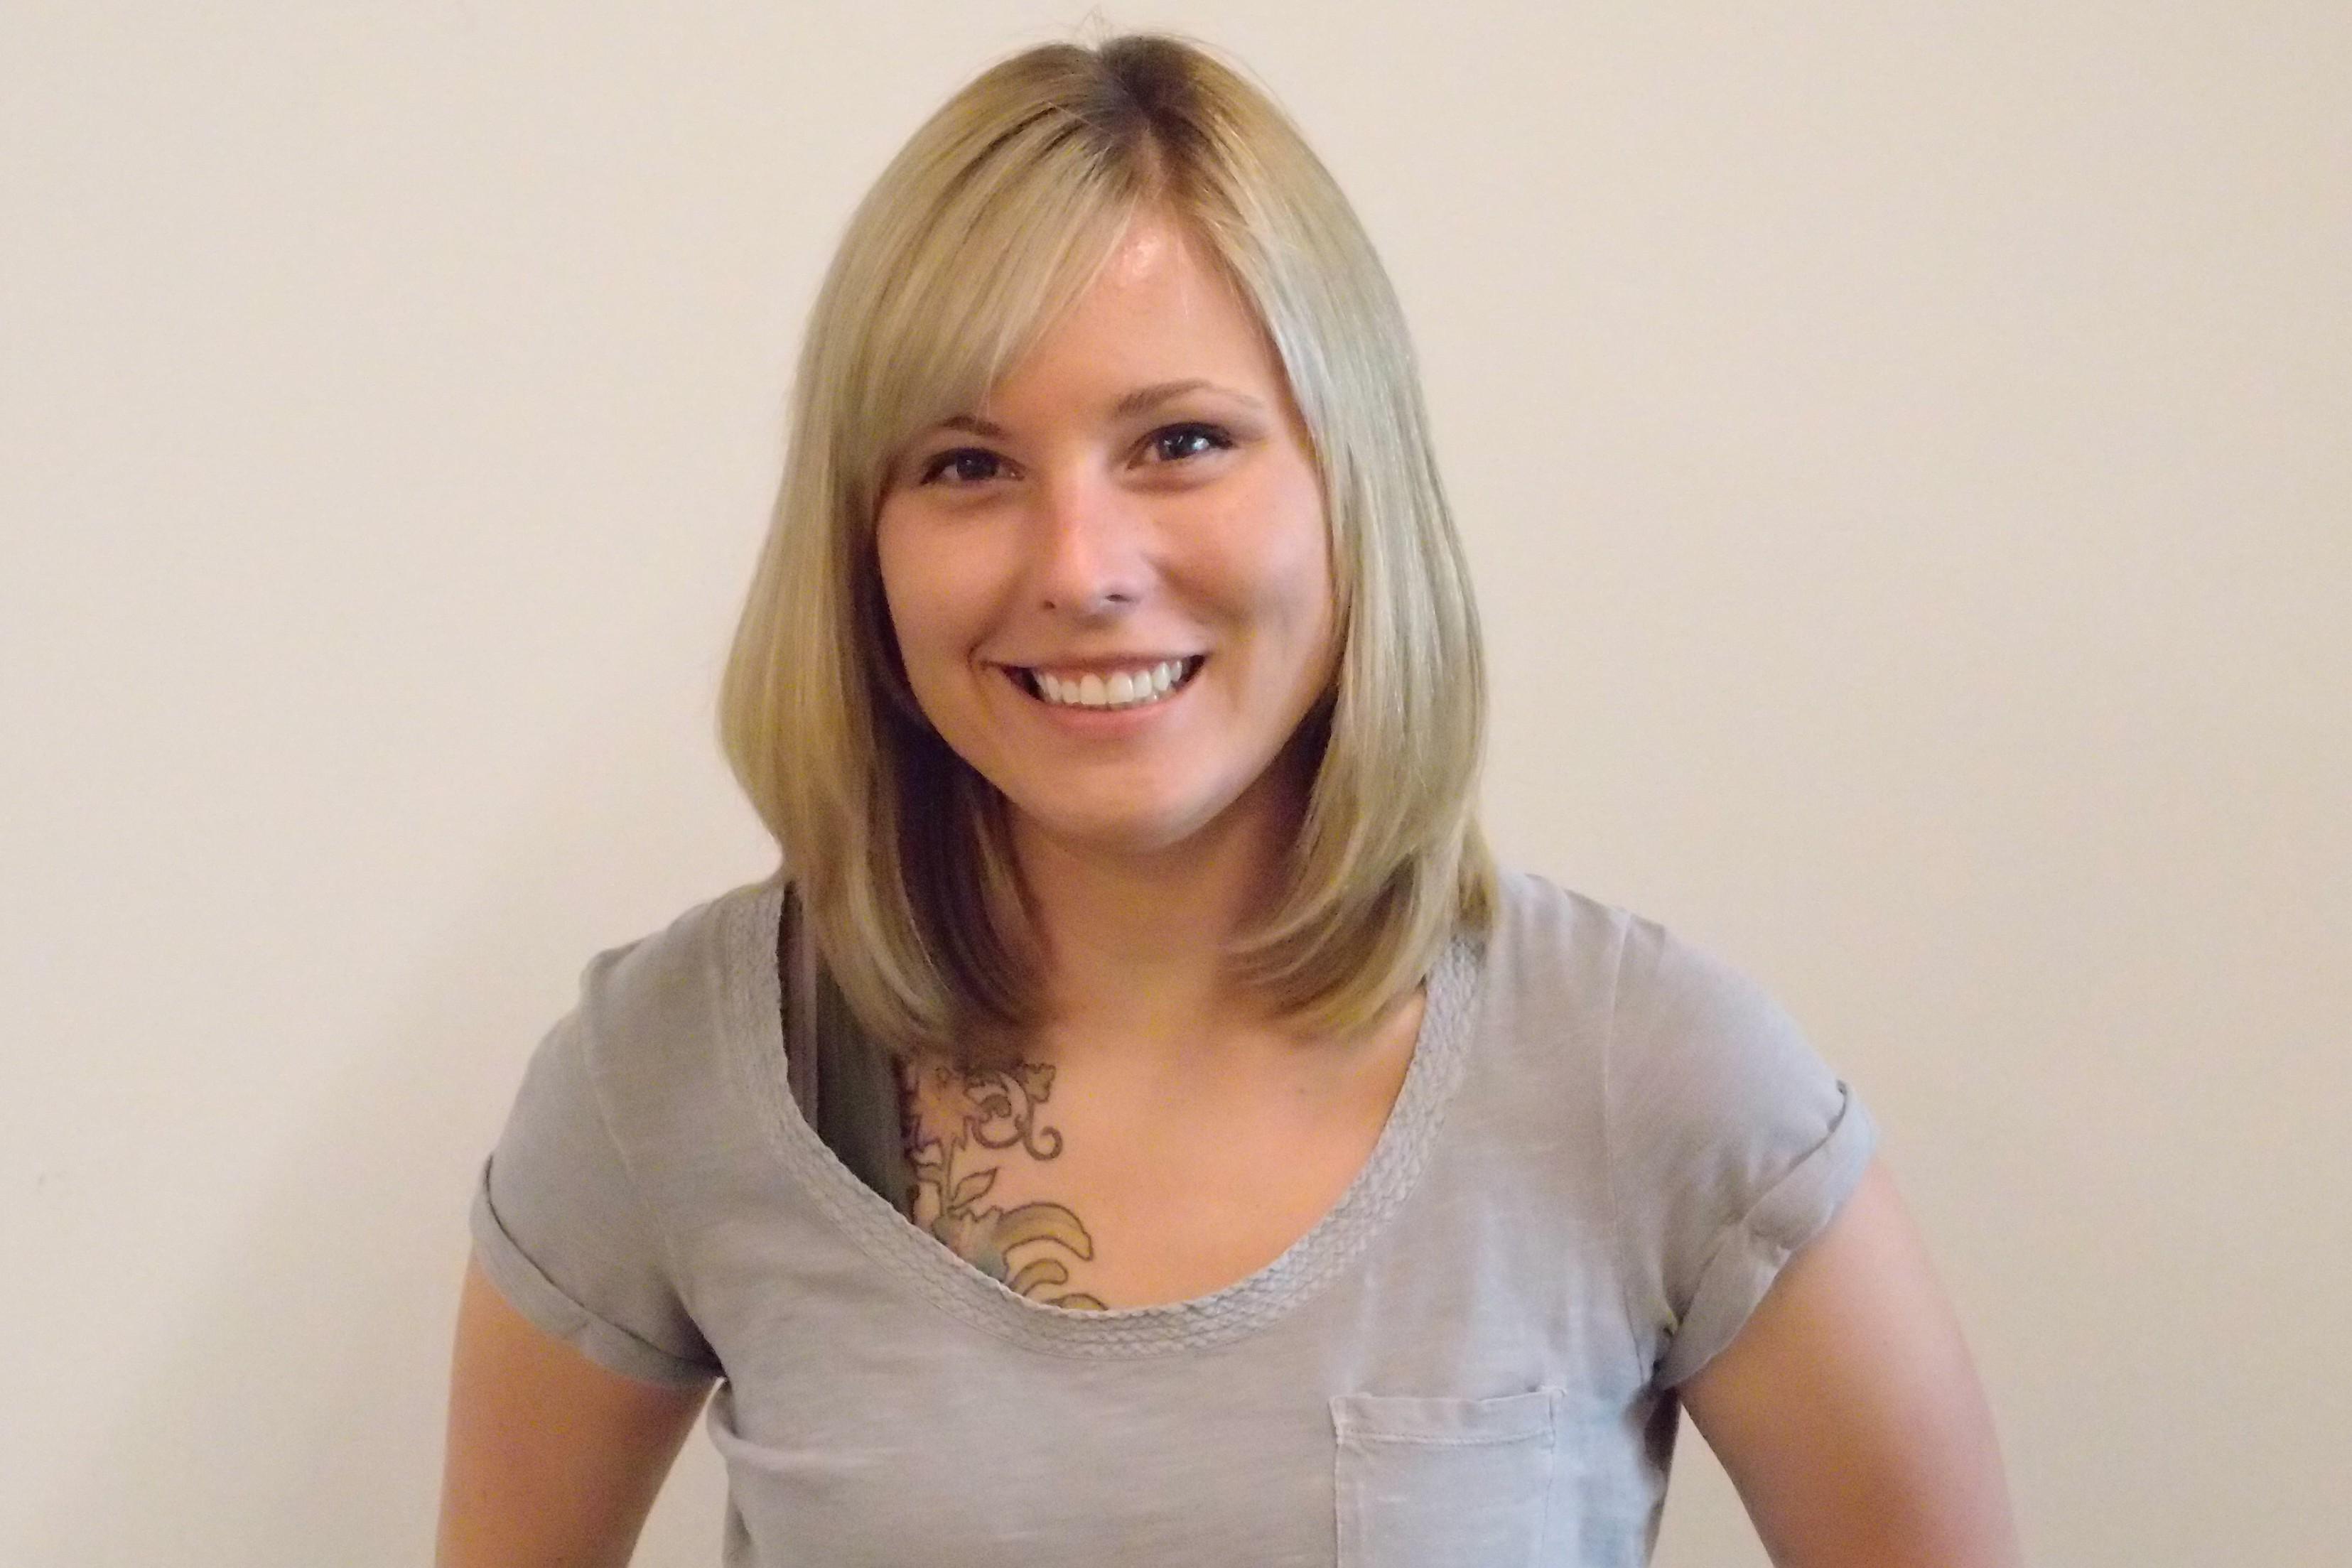 Grove founder Leah Culver